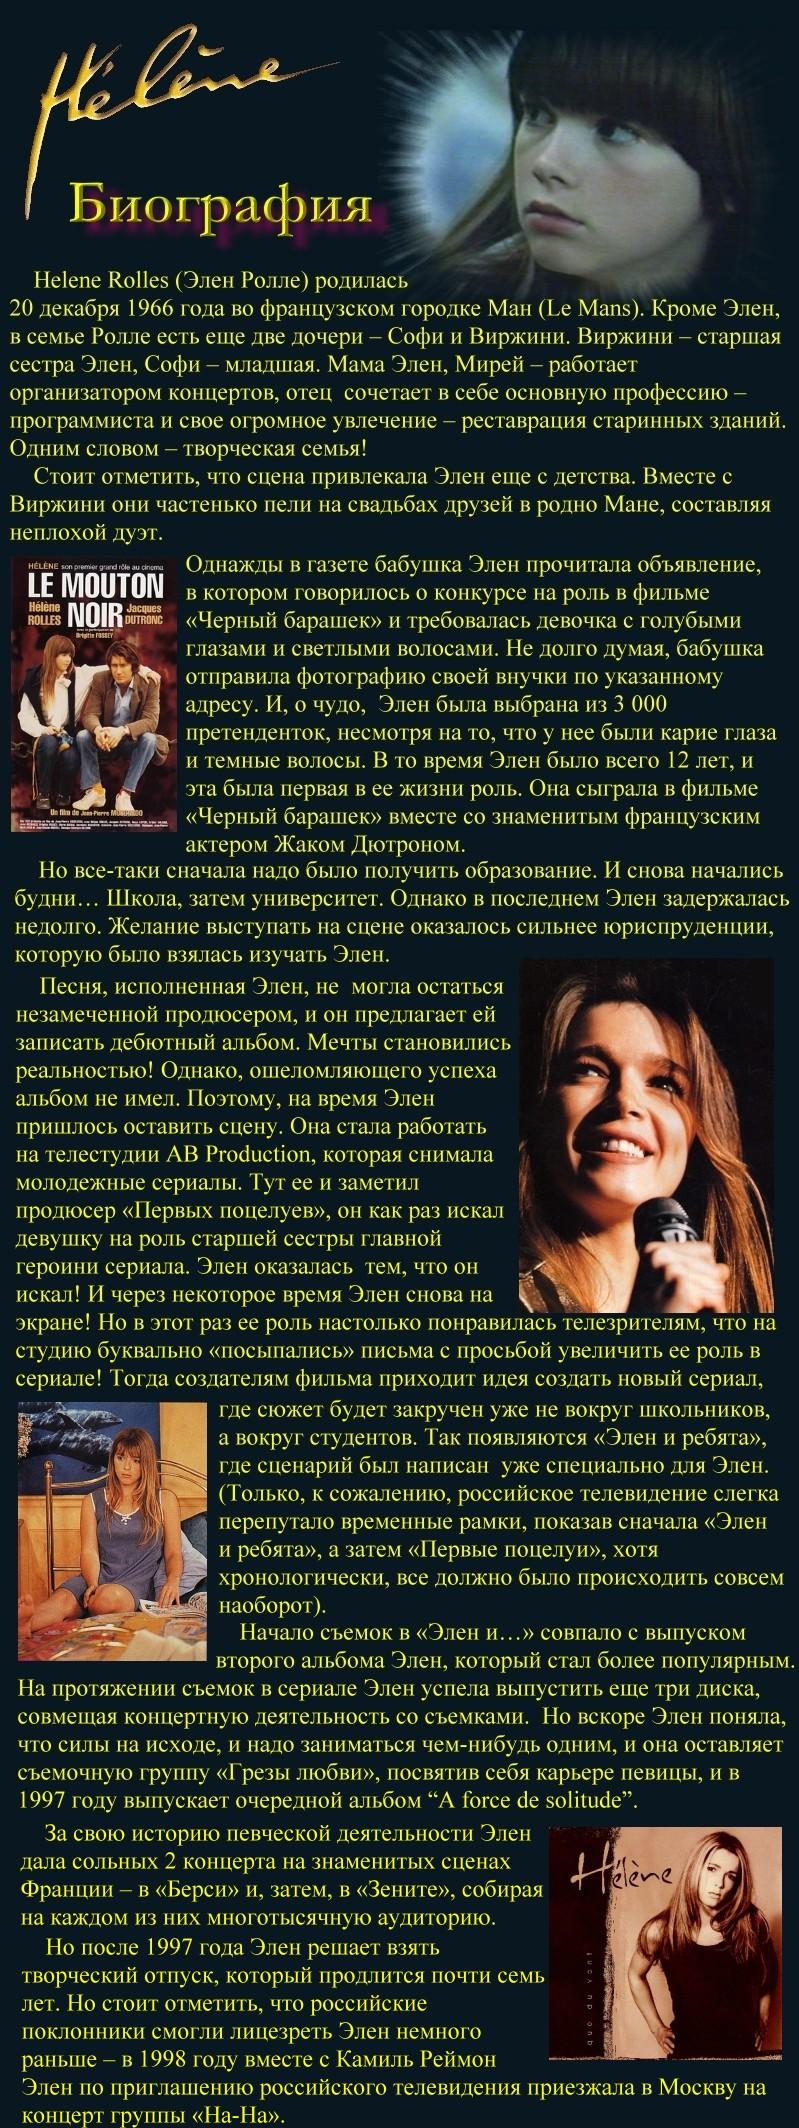 http://reveur.narod.ru/Bio/images/bio_rus_1.jpg